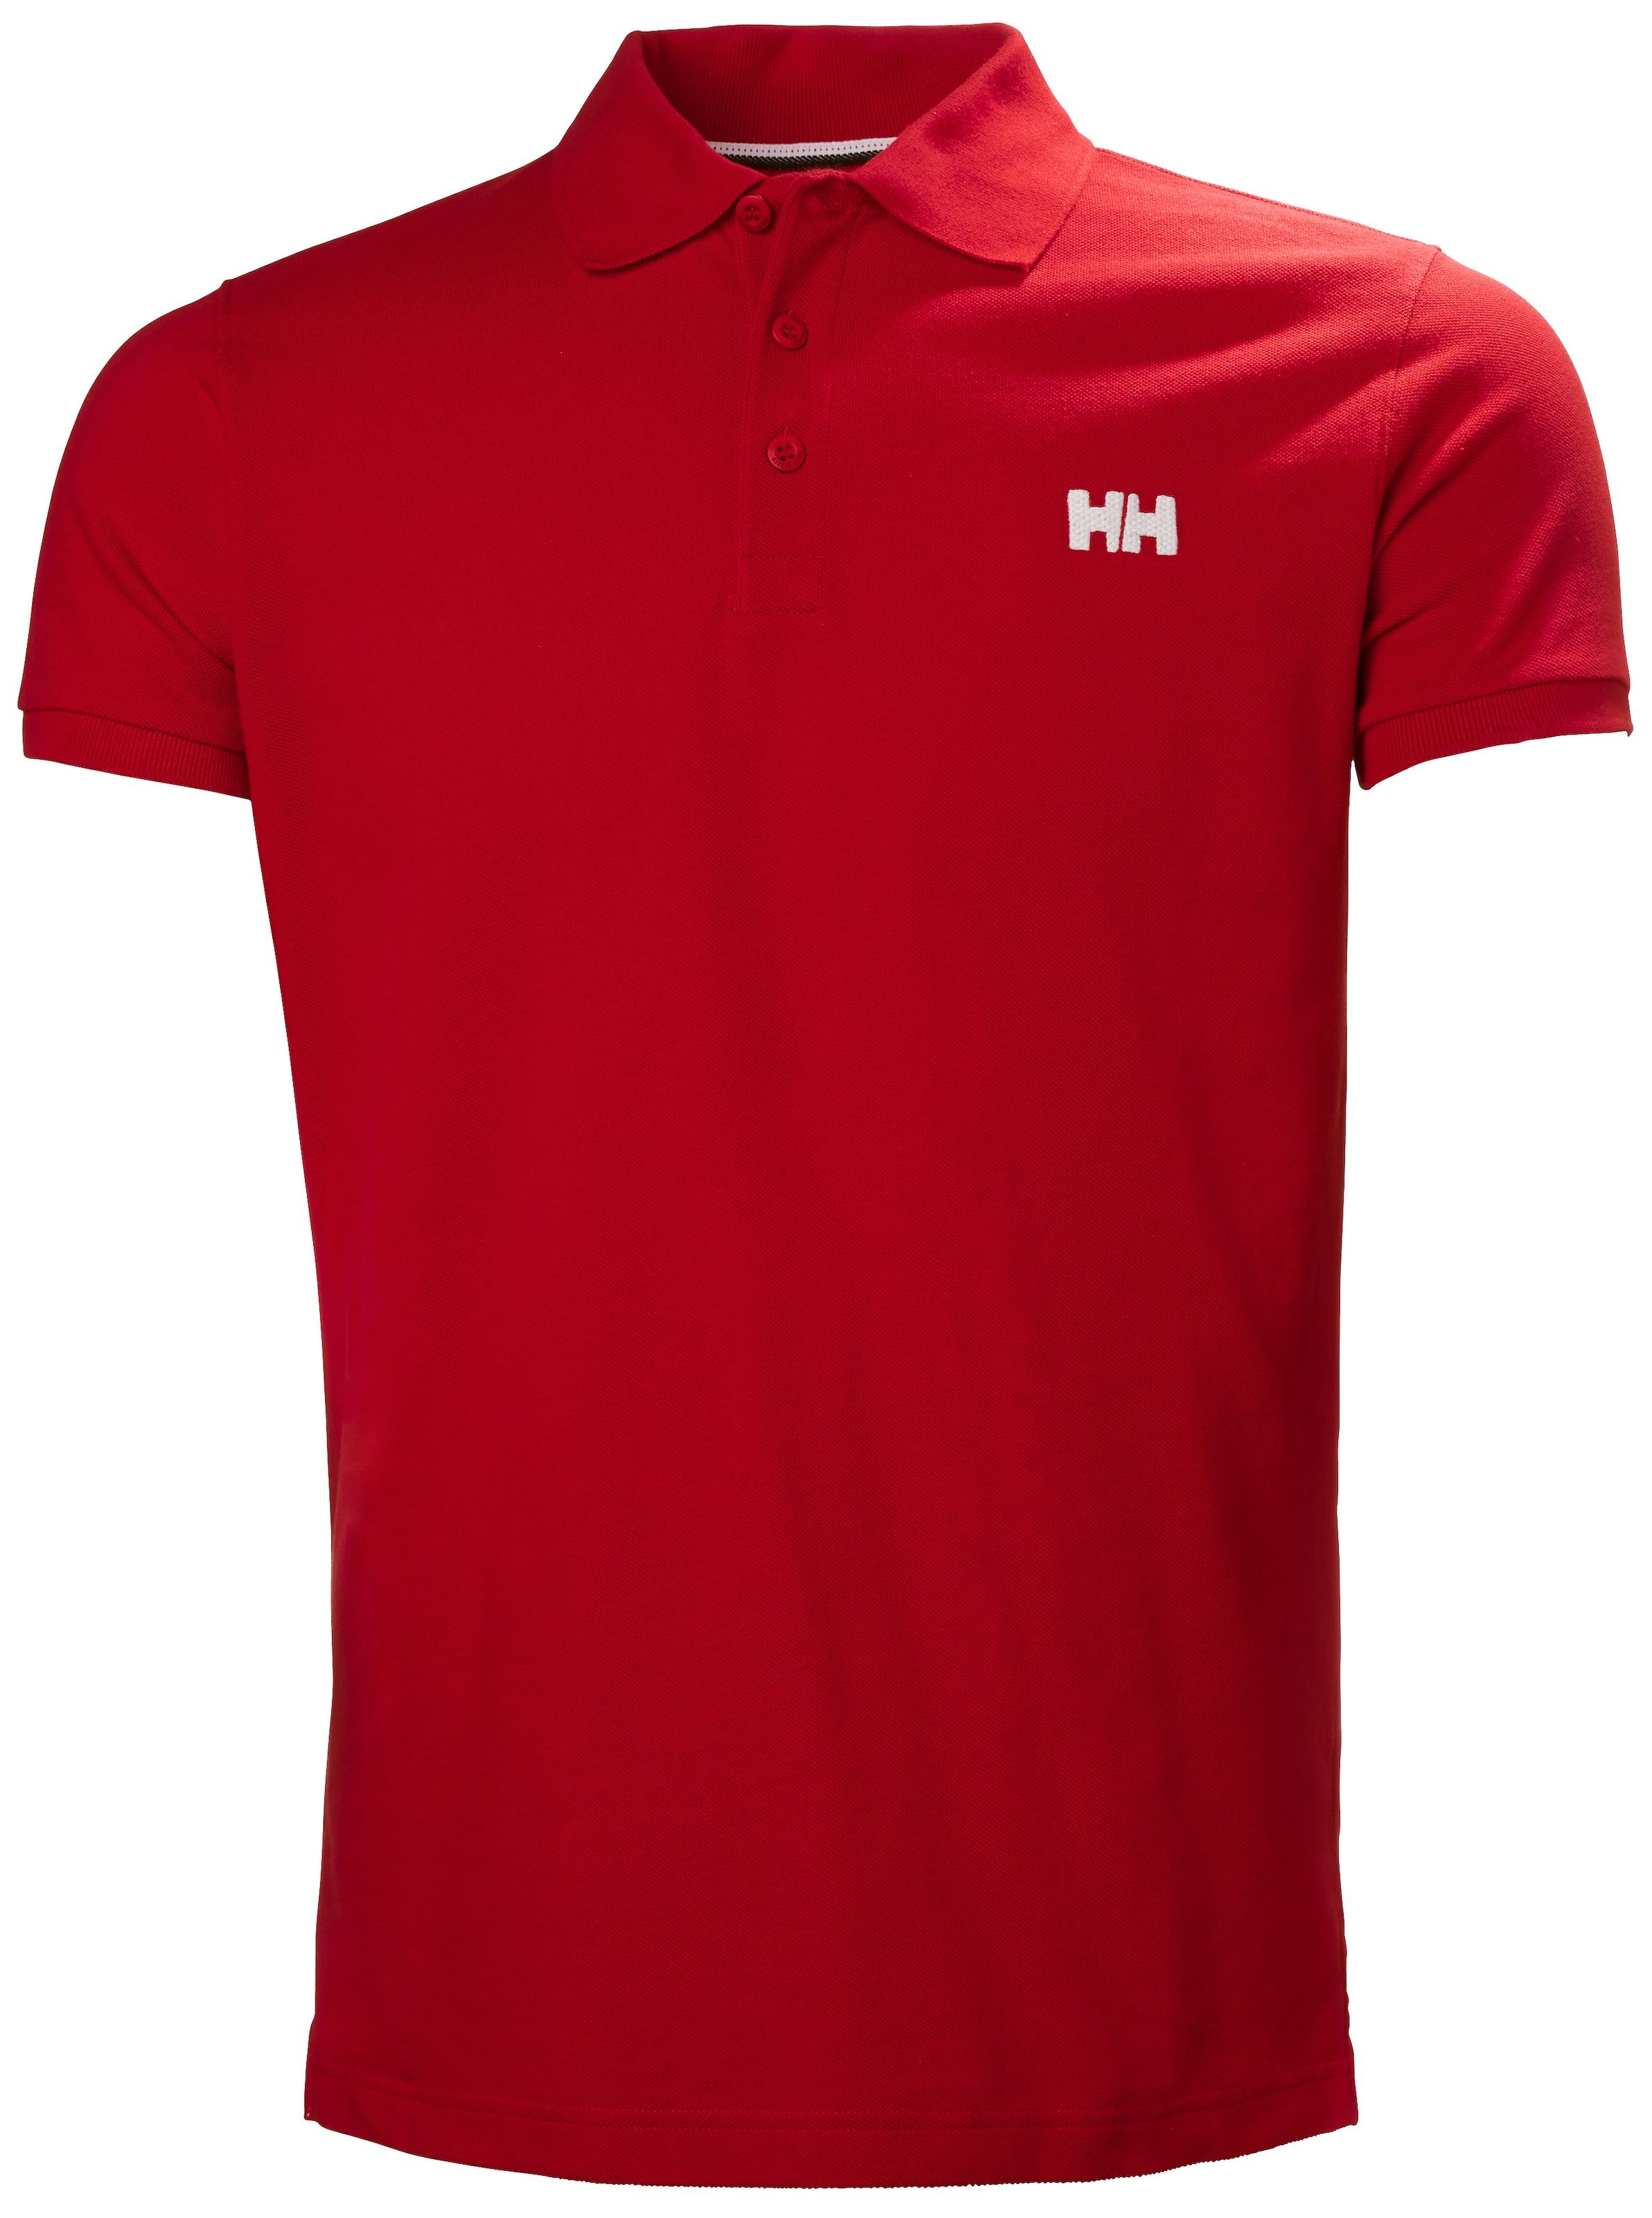 In Poloshirt Helly Poloshirt Poloshirt Rot Hansen In Hansen Hansen In Helly Rot Helly kPXZiTOu